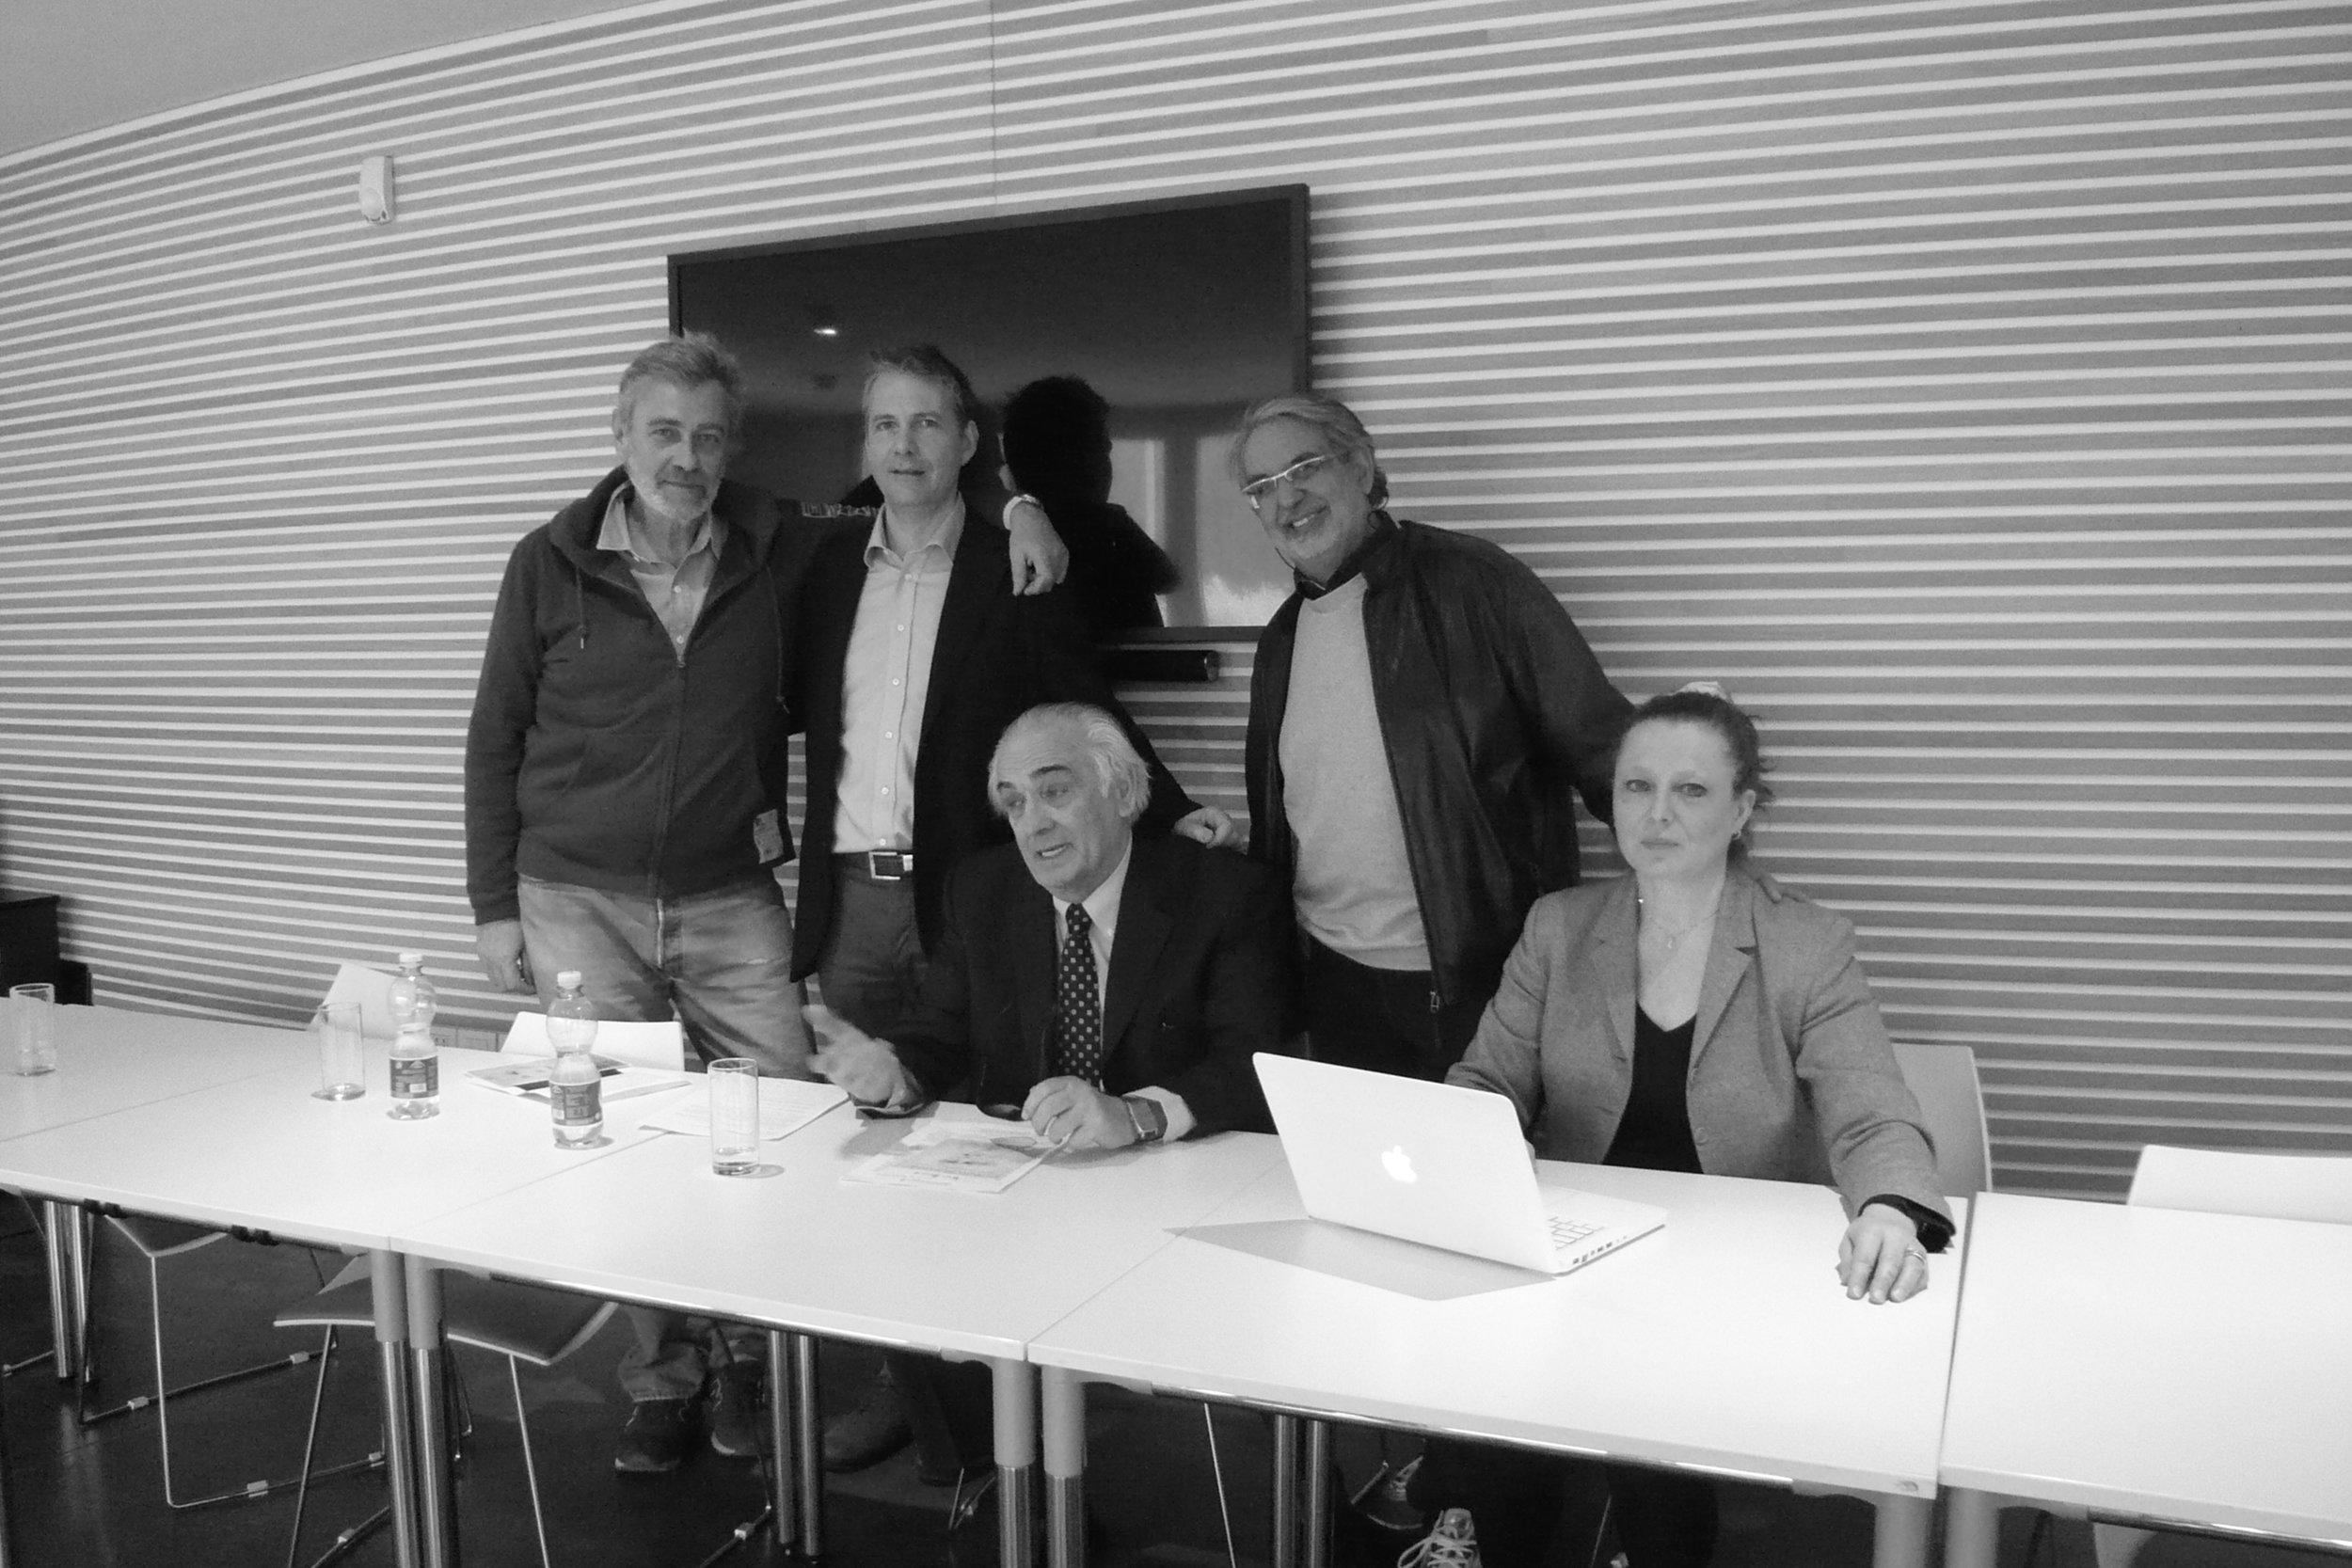 (Left to Right) Andrea Bigiarini - New Era Museum, Marco Di Battista - Member of the Jury, Sen.Alberto Robol - Regent of the Foundation, Giancarlo Beltrame - Nember of the Jury, Lorenza Somogyl Bianchi, Organization at the Press Conference.